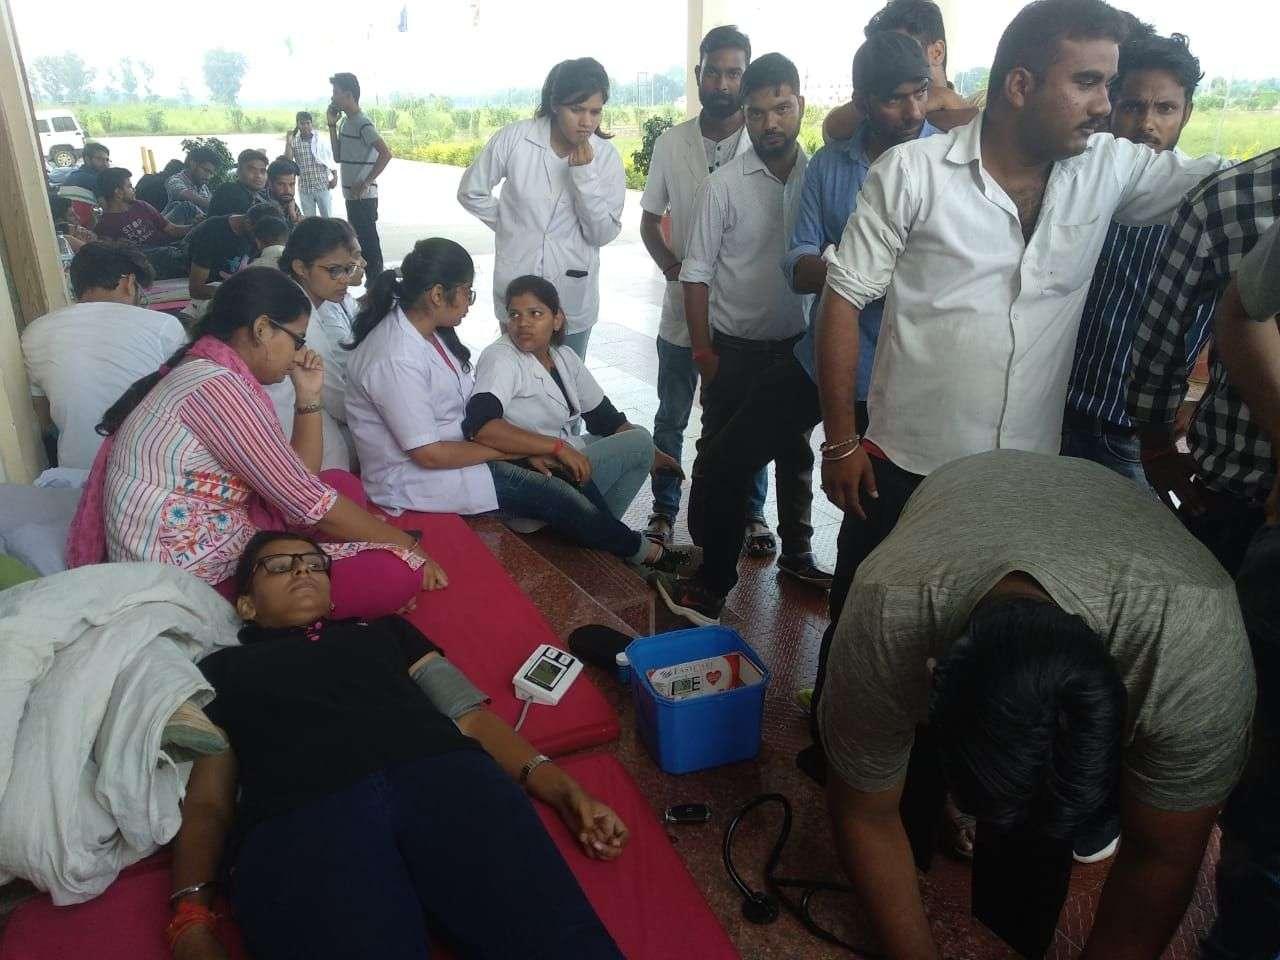 Medical students sitting on hunger strike deteriorate